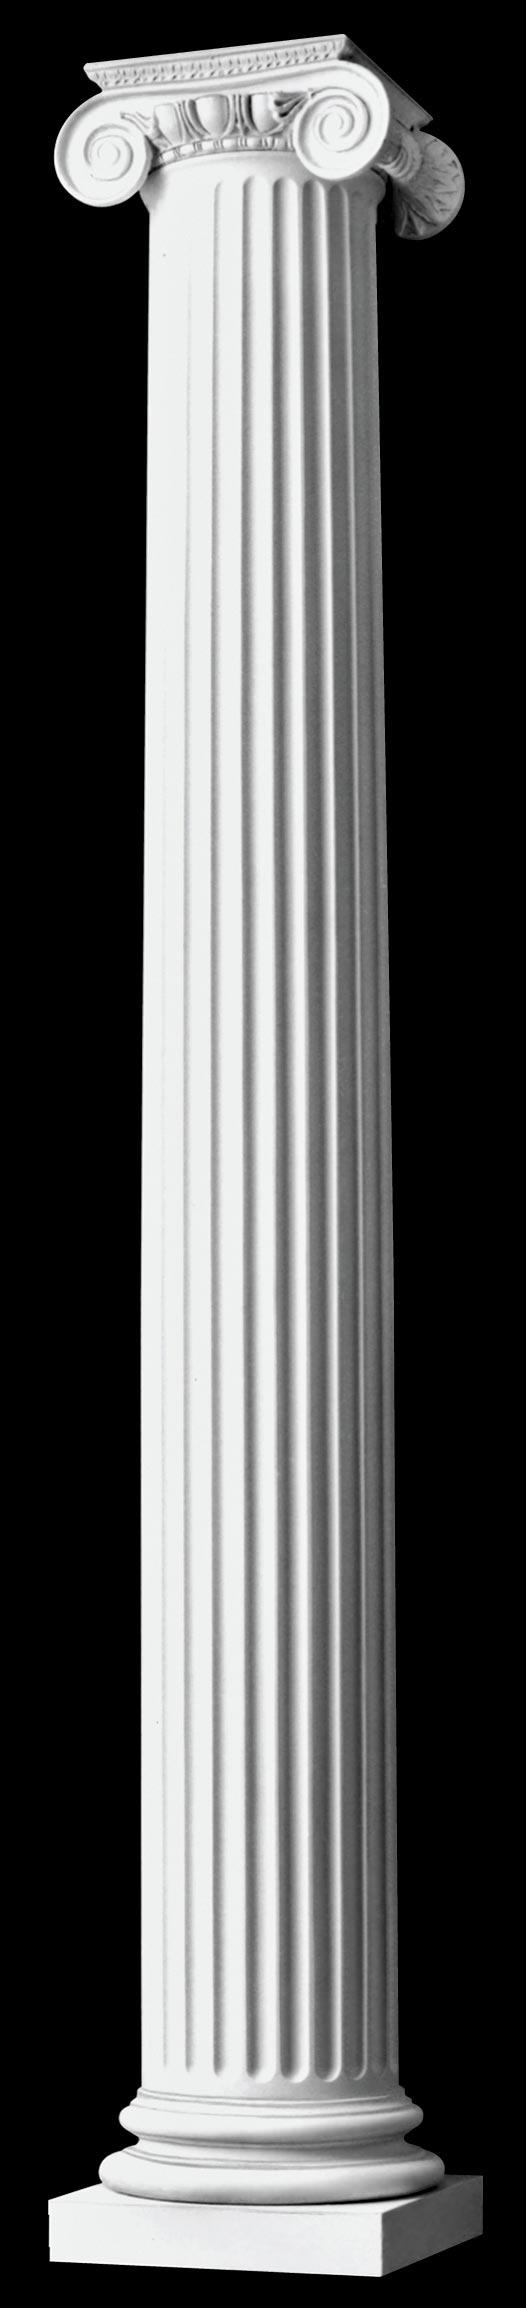 Load Bearing Columns Exterior Home Design